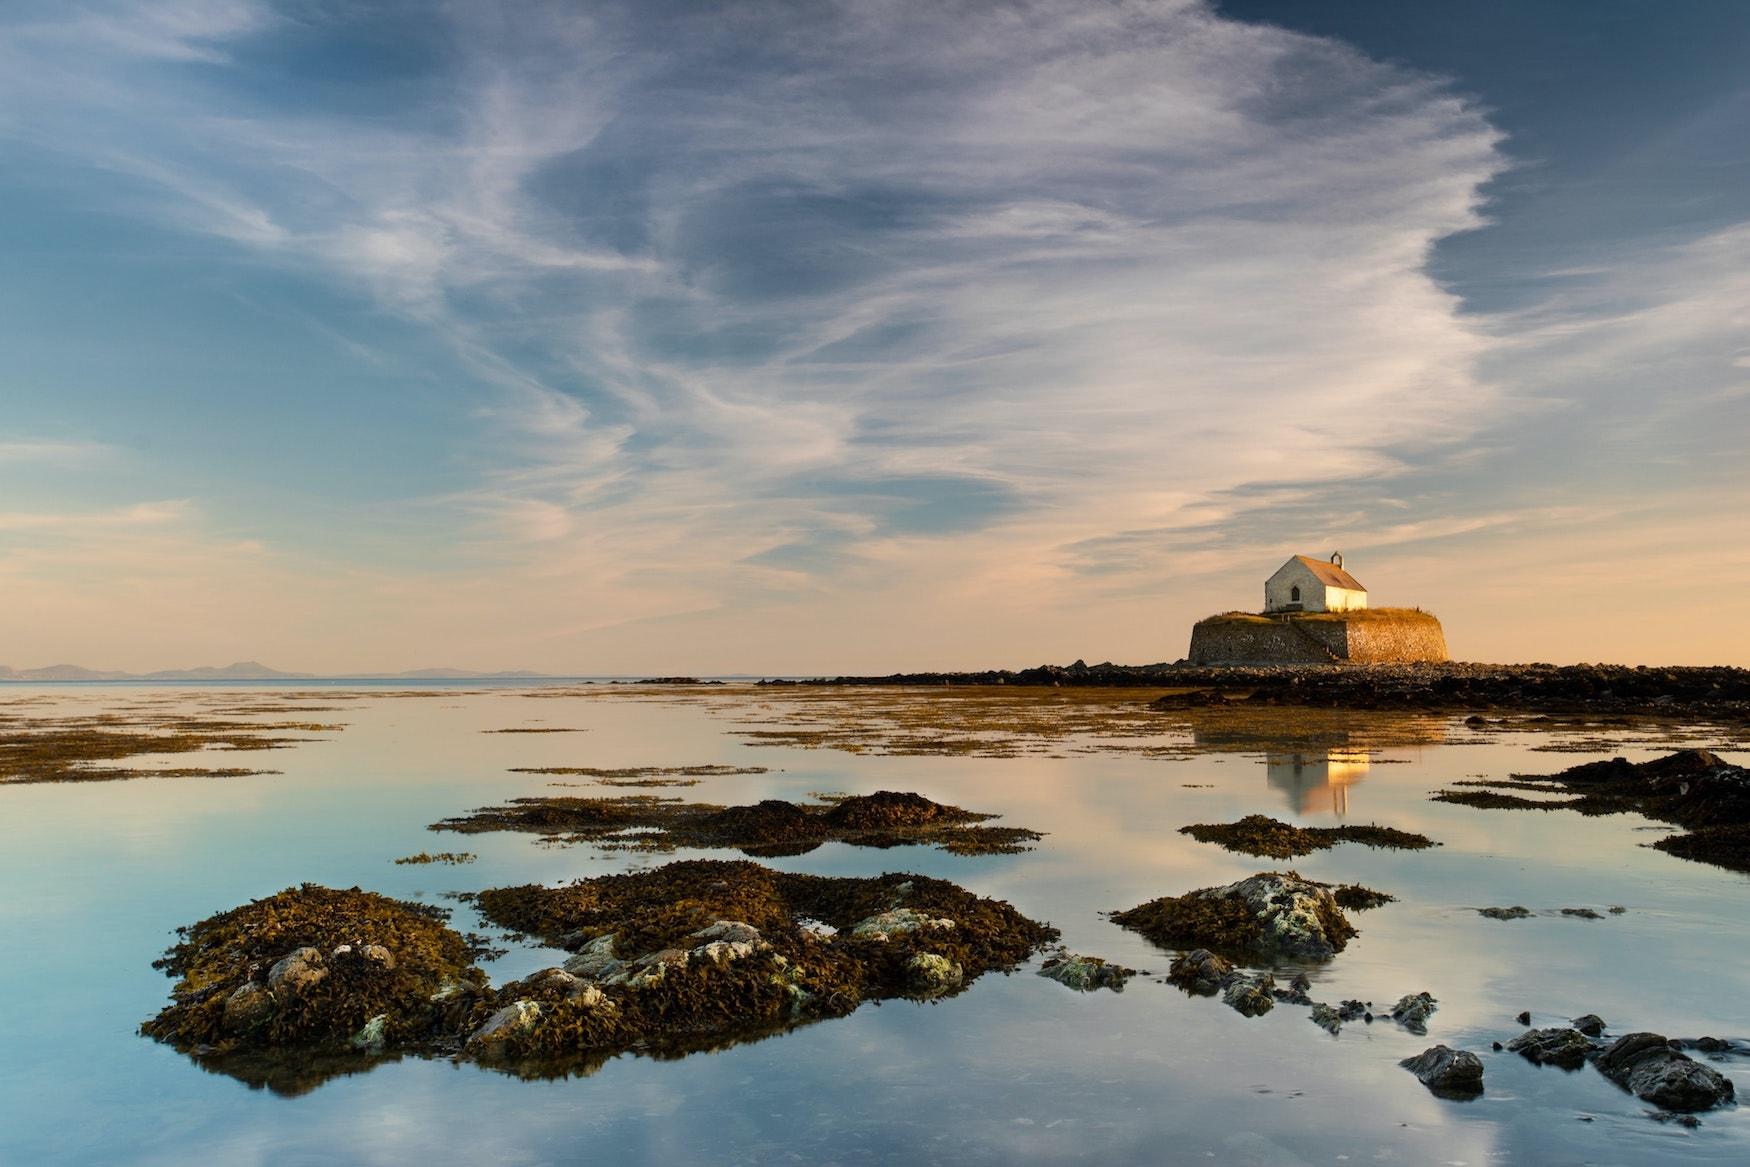 Kapelle mitten im Meer auf Anglesey